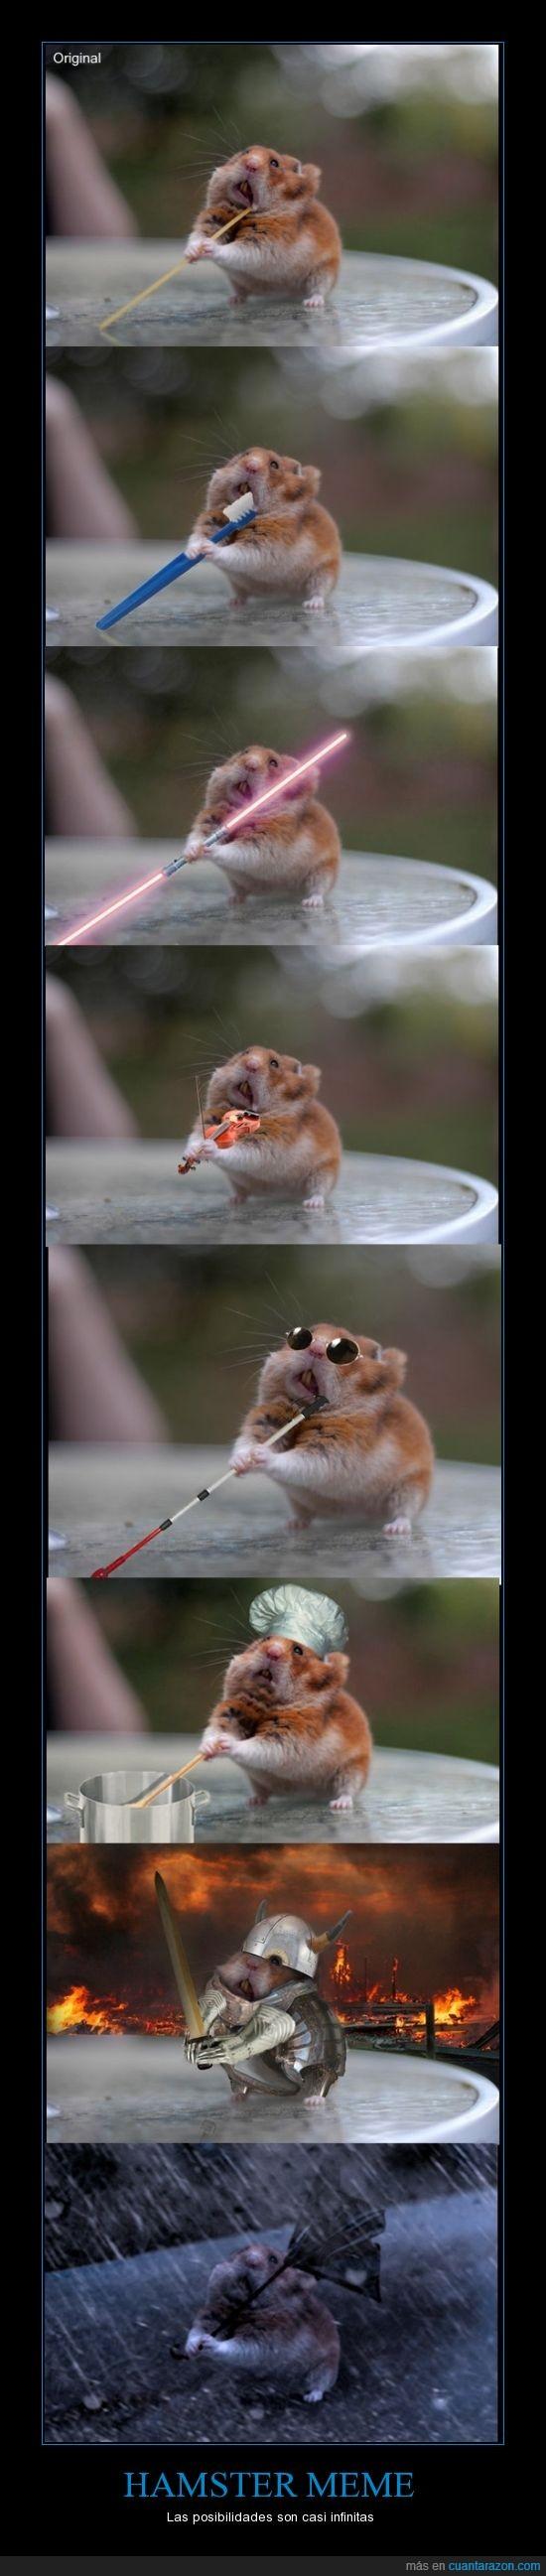 chop,dientes,espada,foto,hamster,laser,meme,montaje,raton